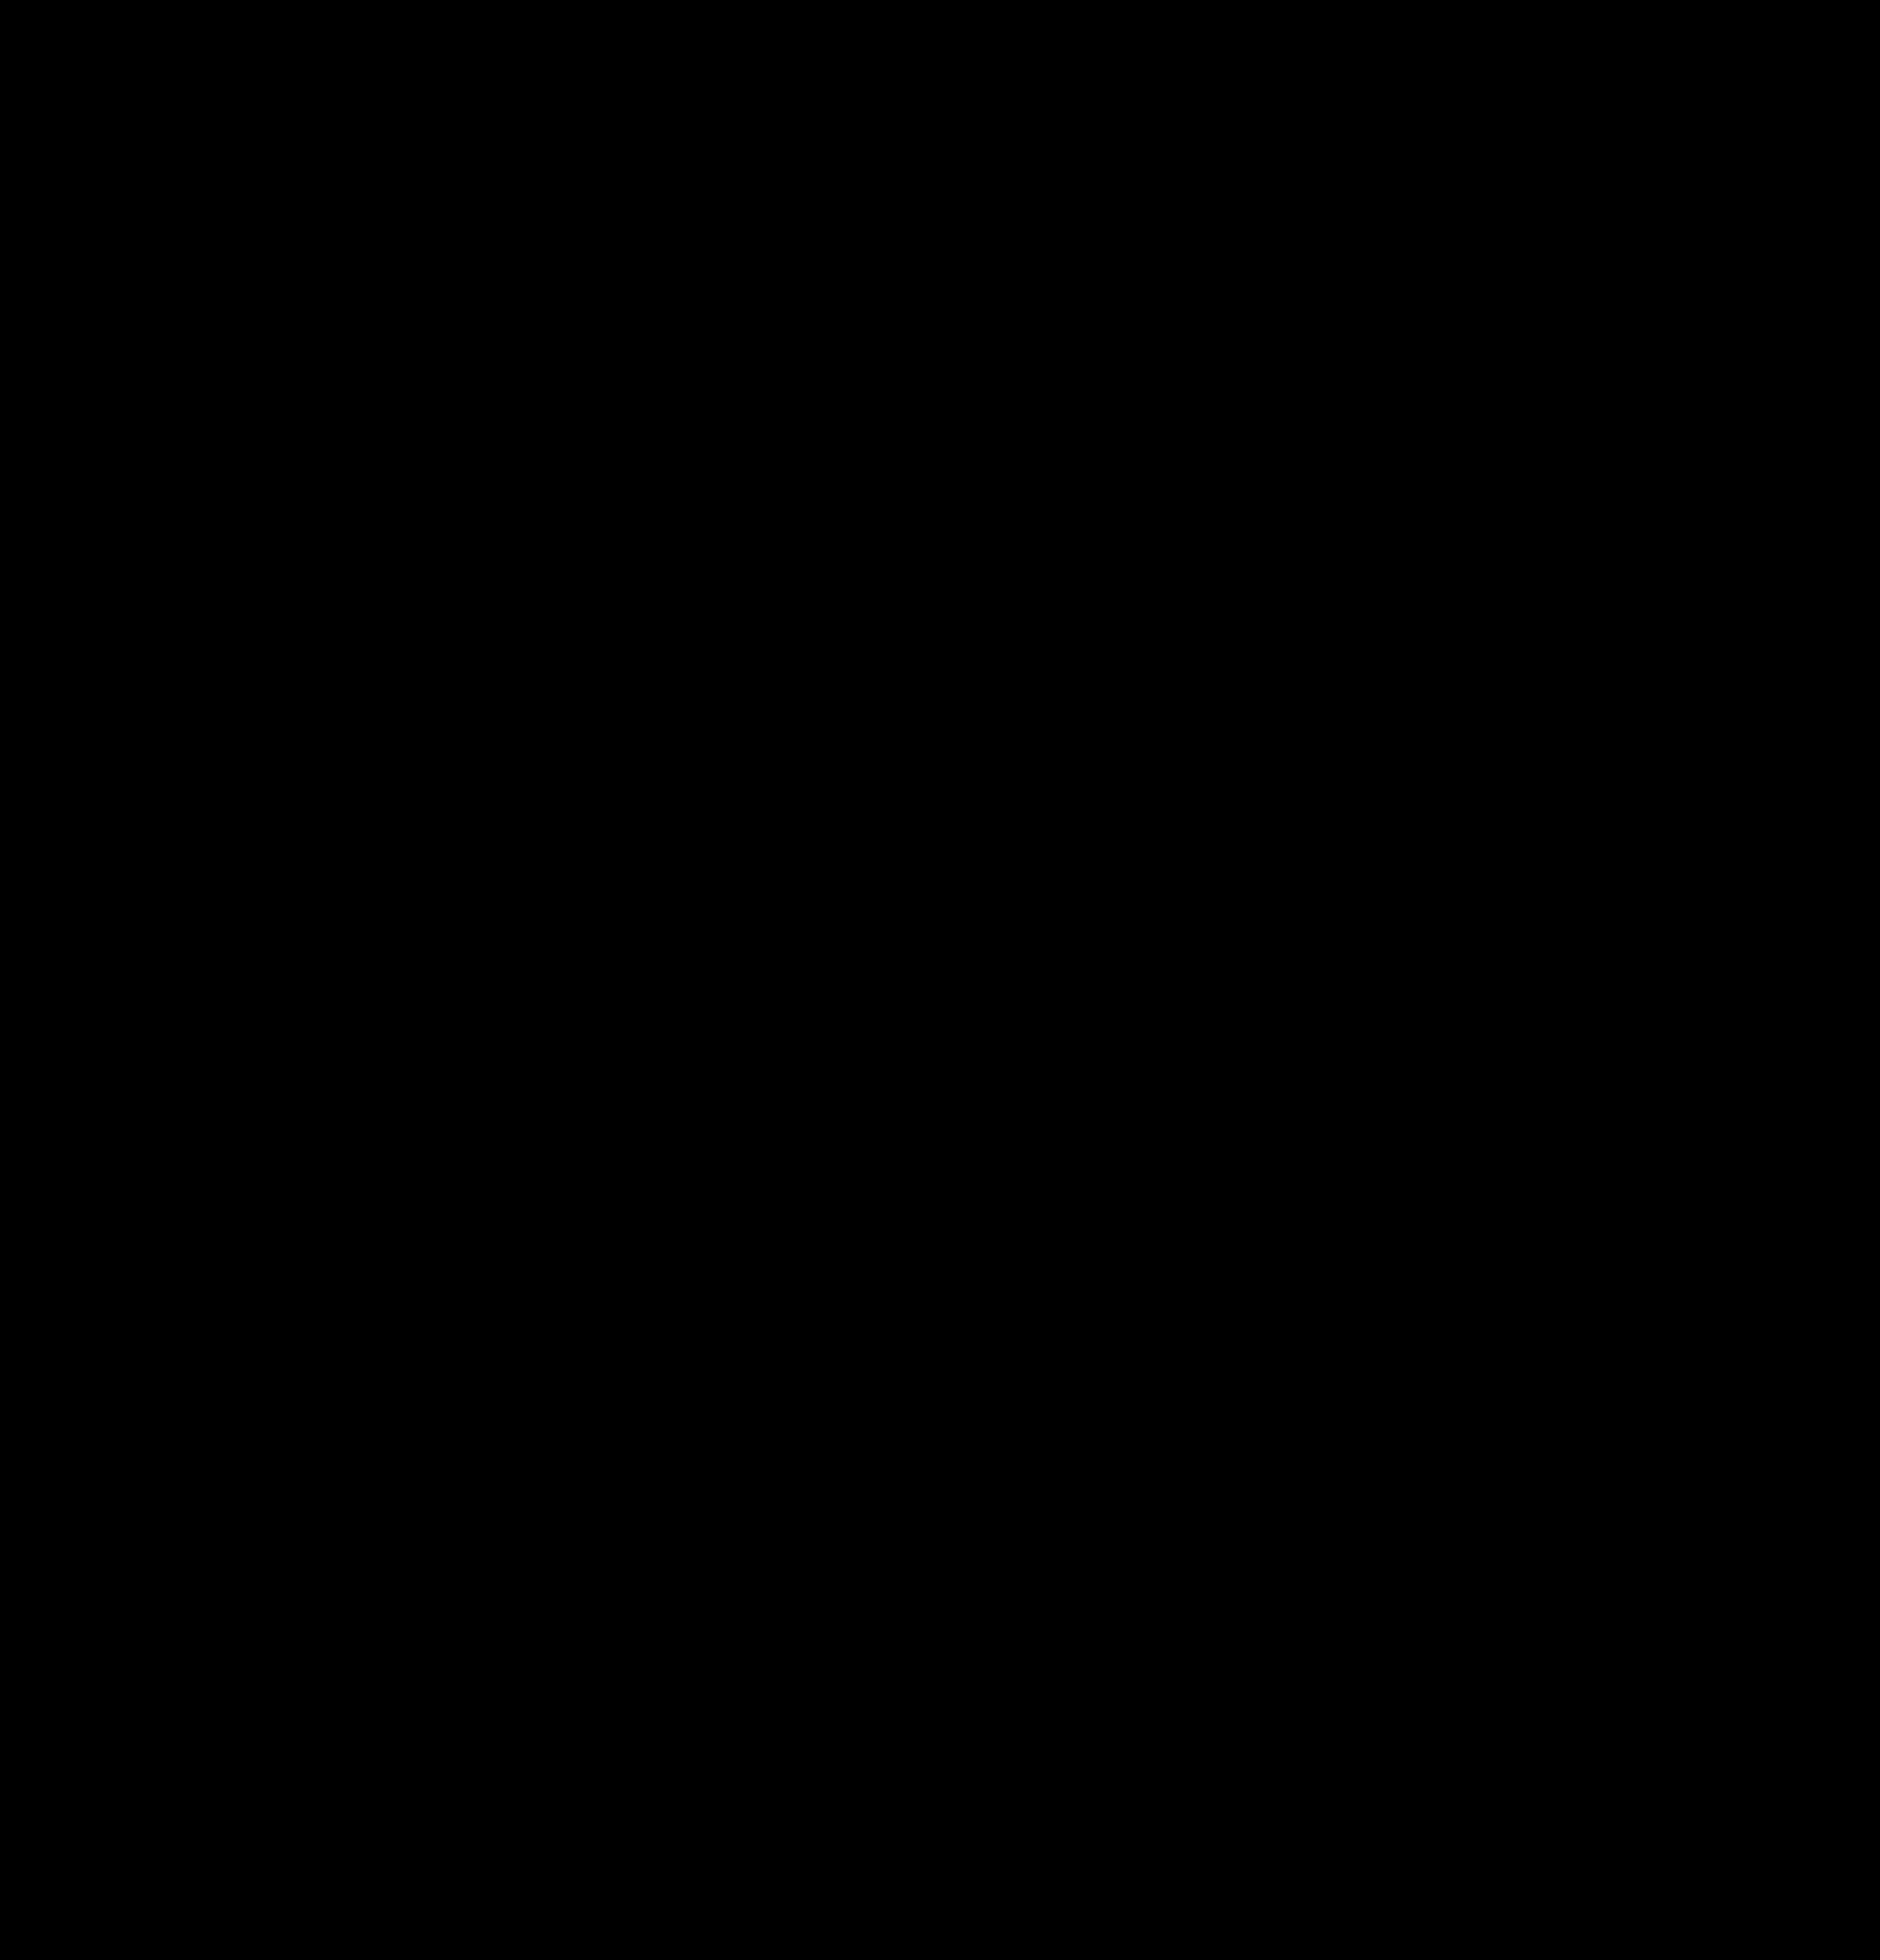 Dragon clip art fly. Clipart bread silhouette